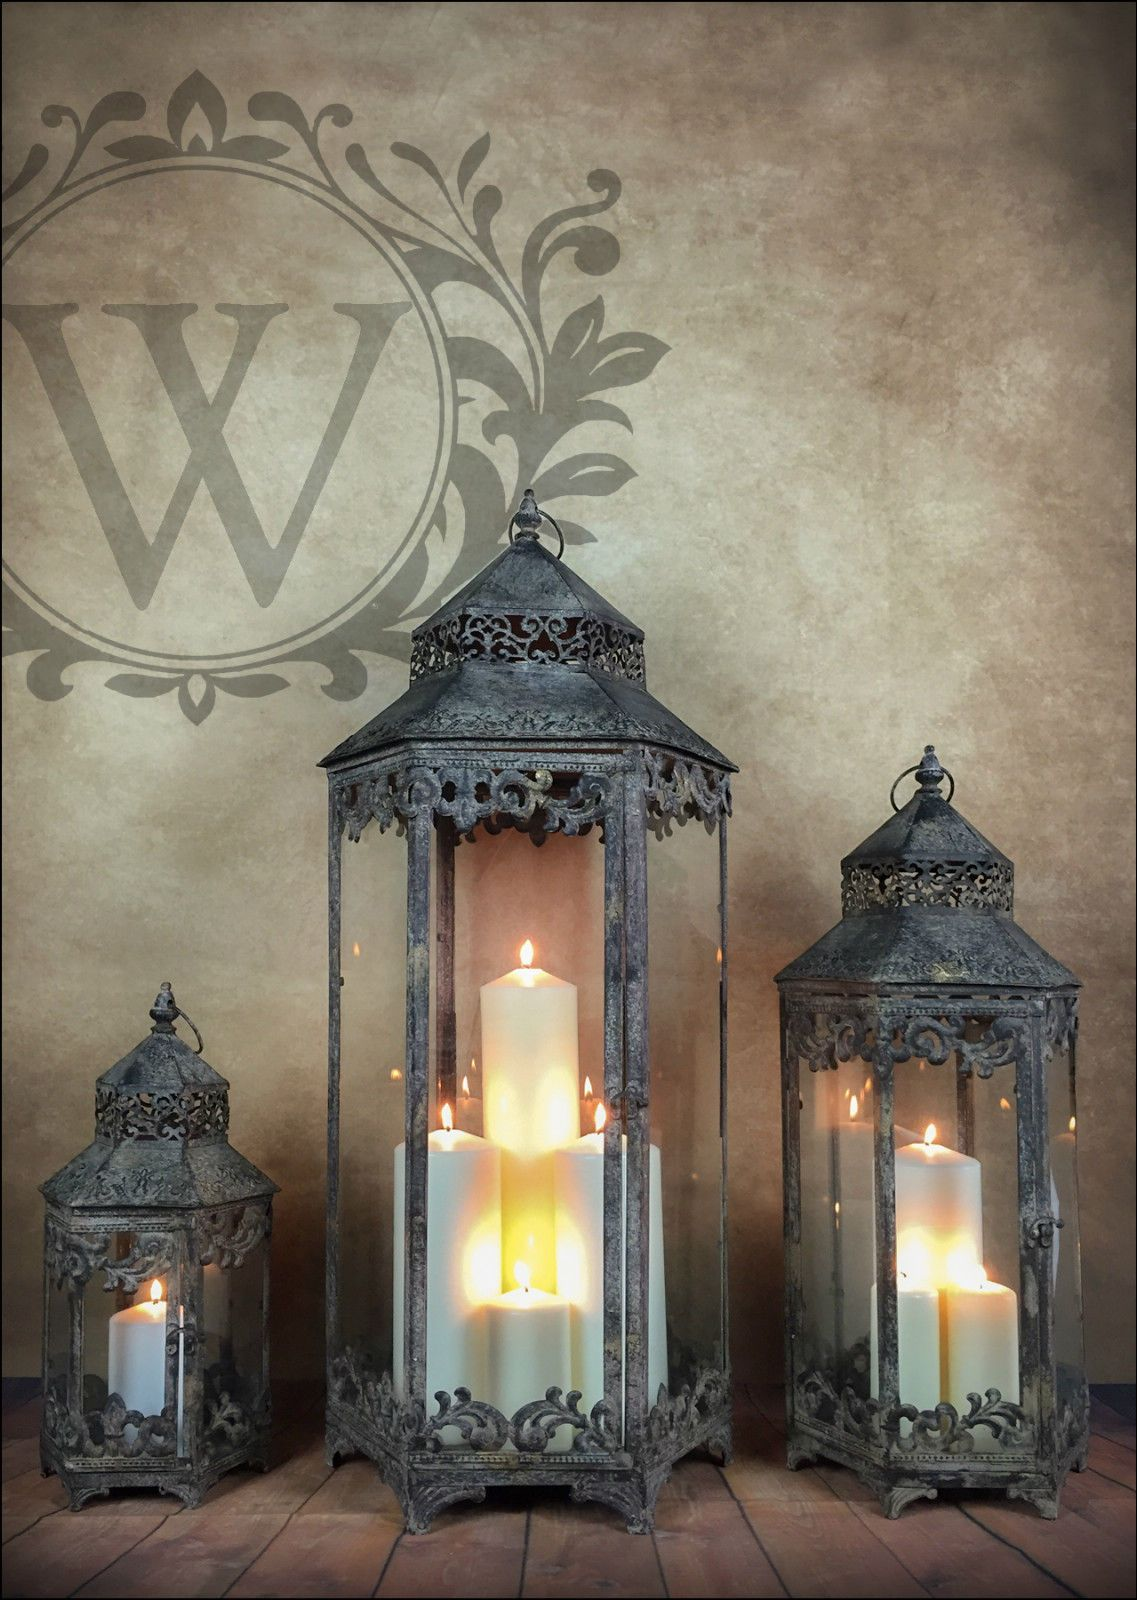 Vintage Ornate LED Lantern Table Lamp Indoor Home Decor Lighting White Metal NEW